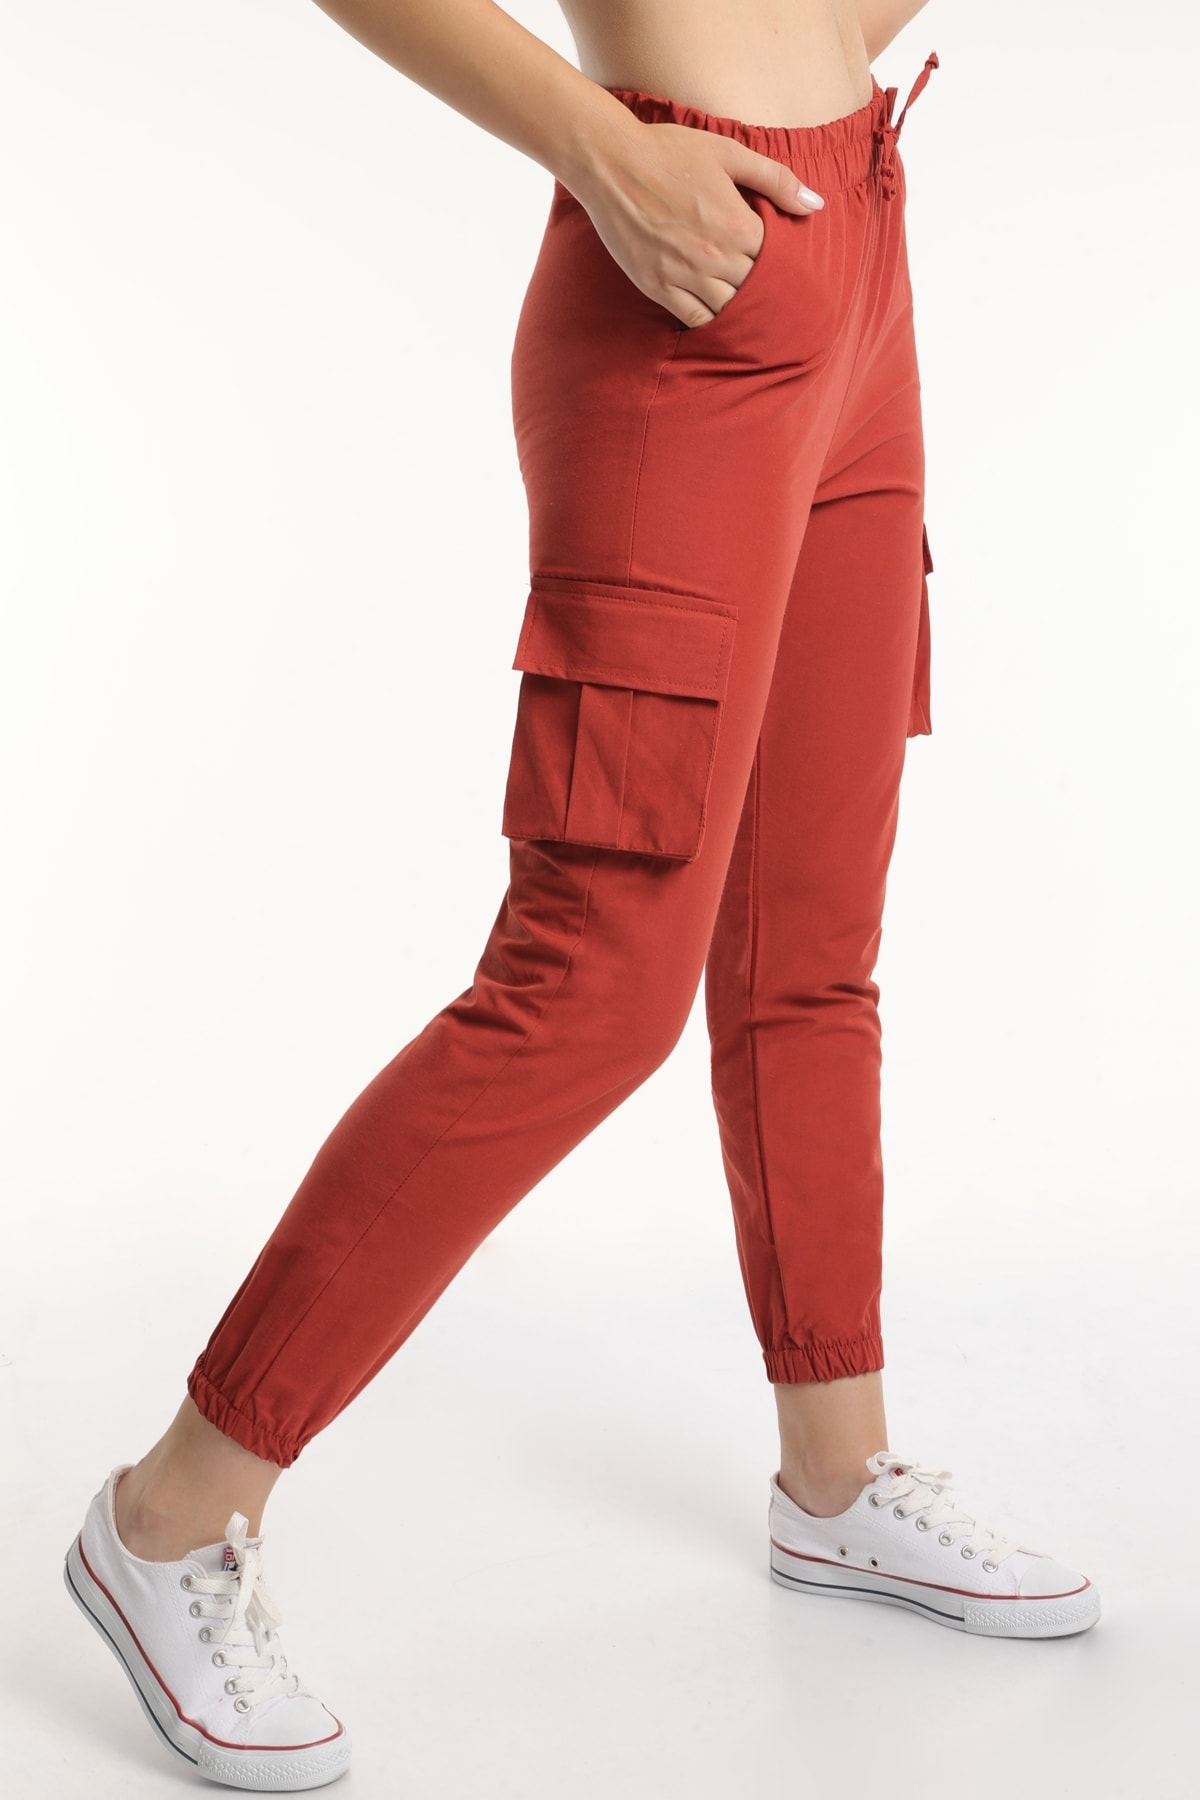 MD trend Kadın Kiremit Bel Lastikli Kargo Pantolon Mdt6582 1